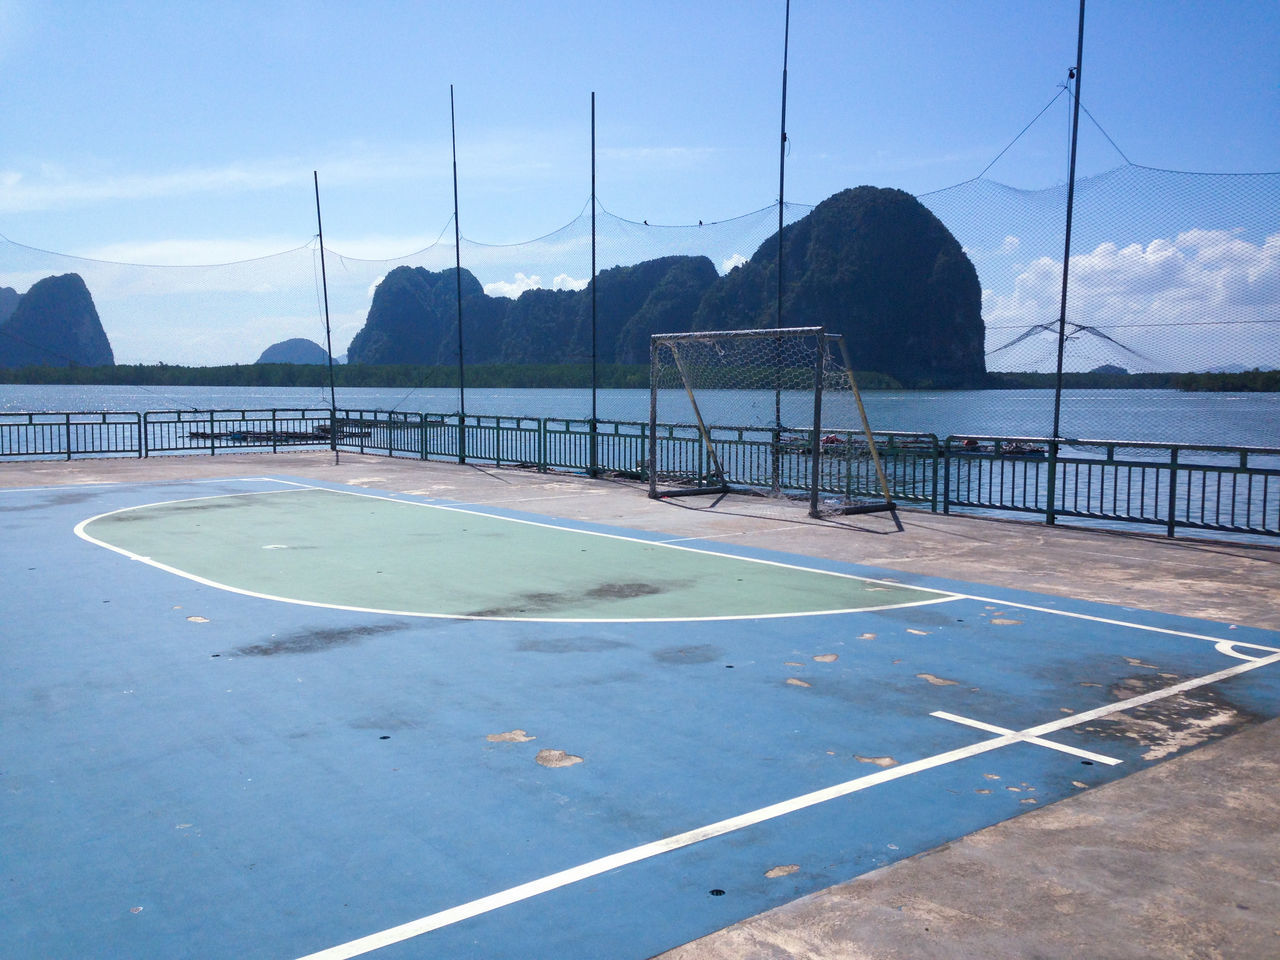 Soccer Field By River